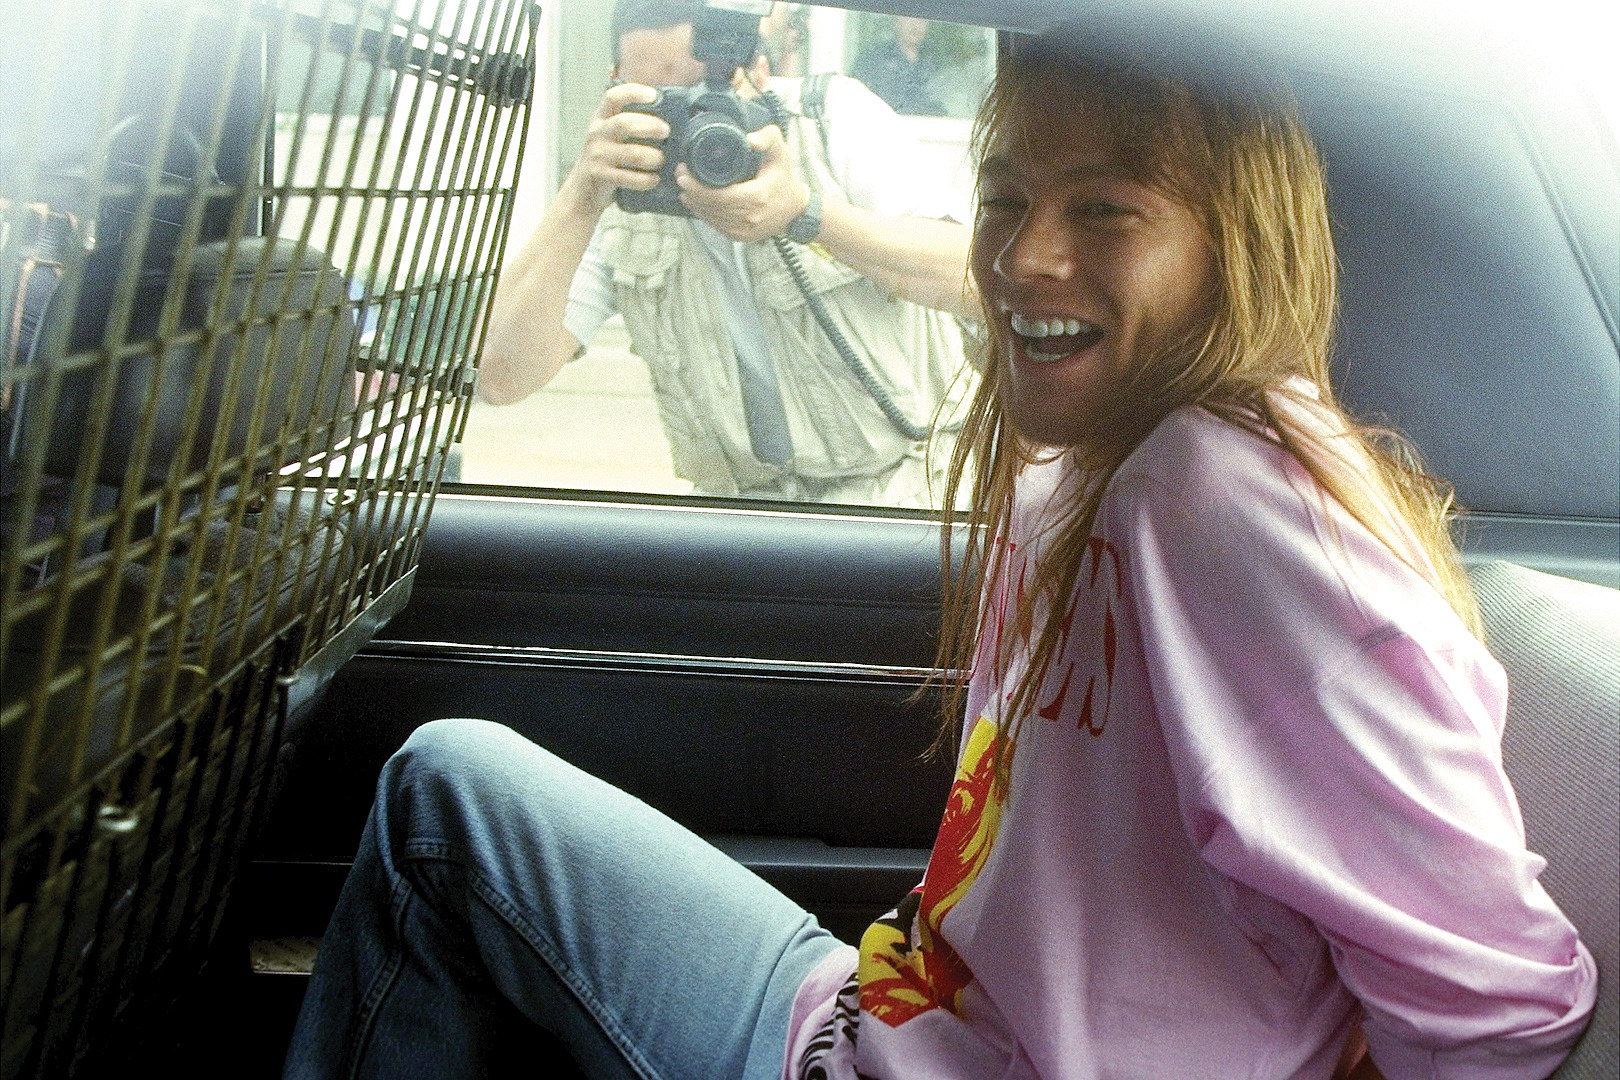 11 Infamous Rock Star Arrests Tendencies Kaos Beastie Boys Japan Navy M